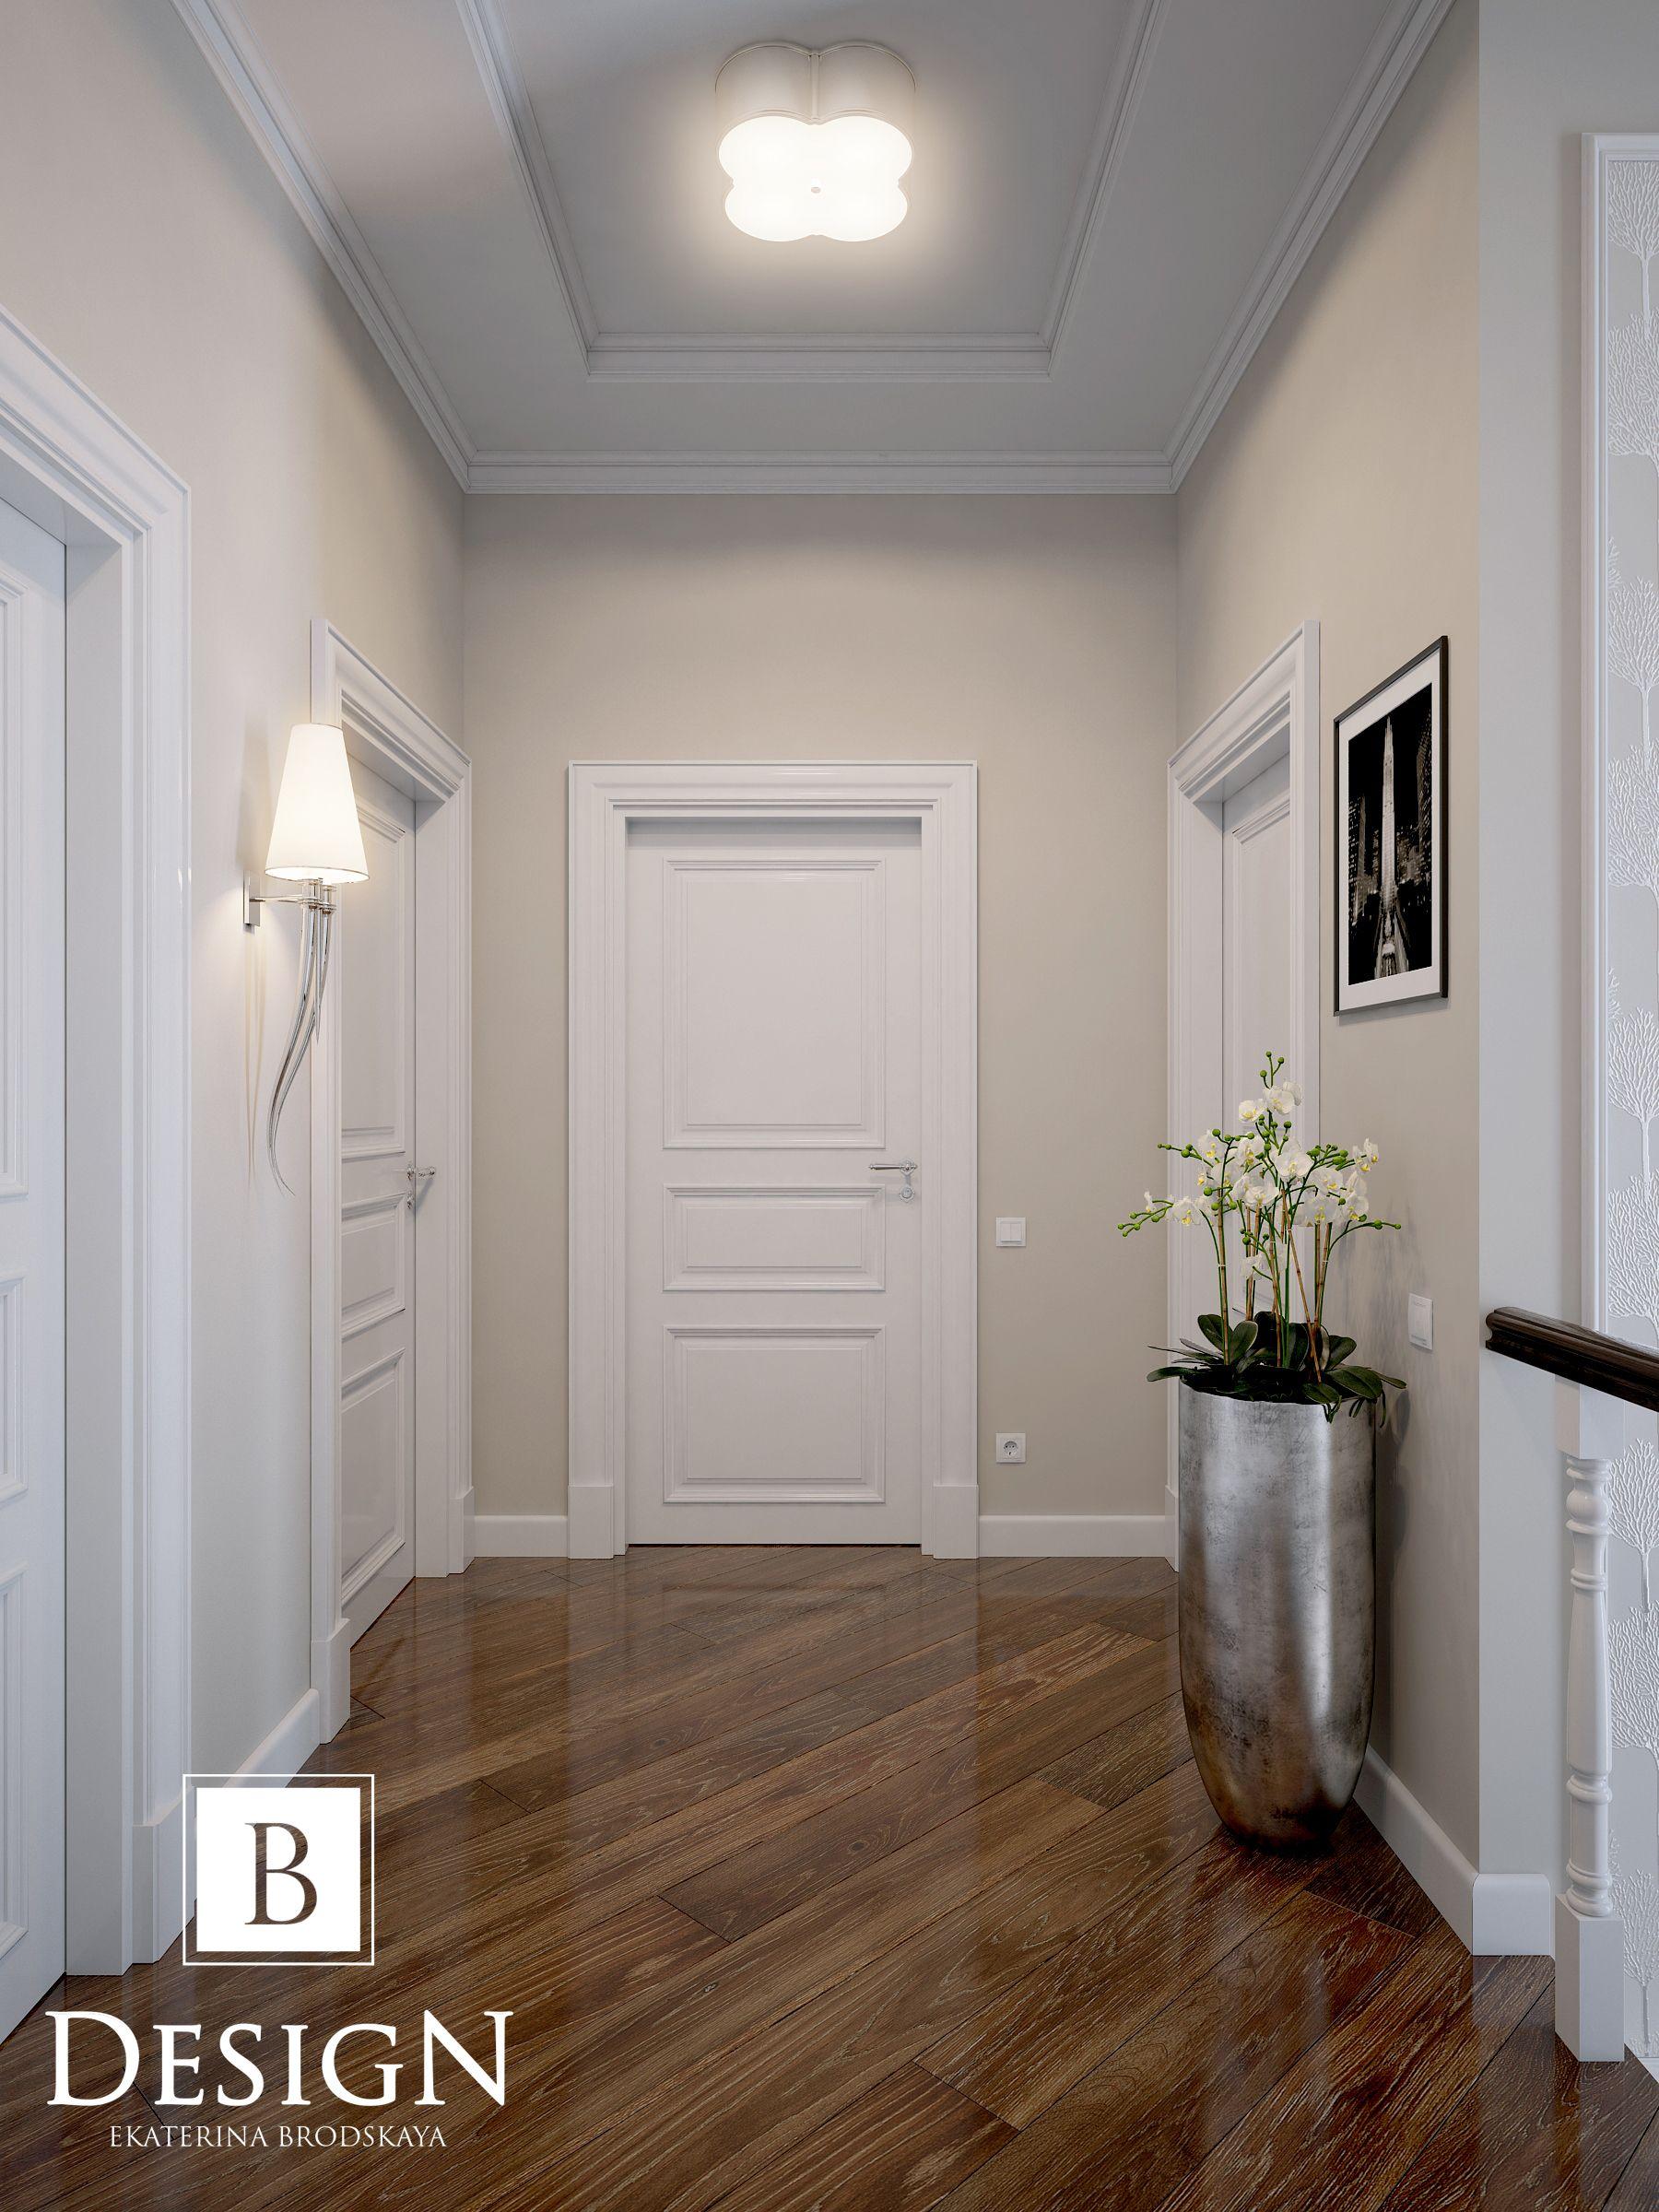 Narrow hallway colours  Цвет стен Укладка  Идеи для дома  Pinterest  Interiors Corridor